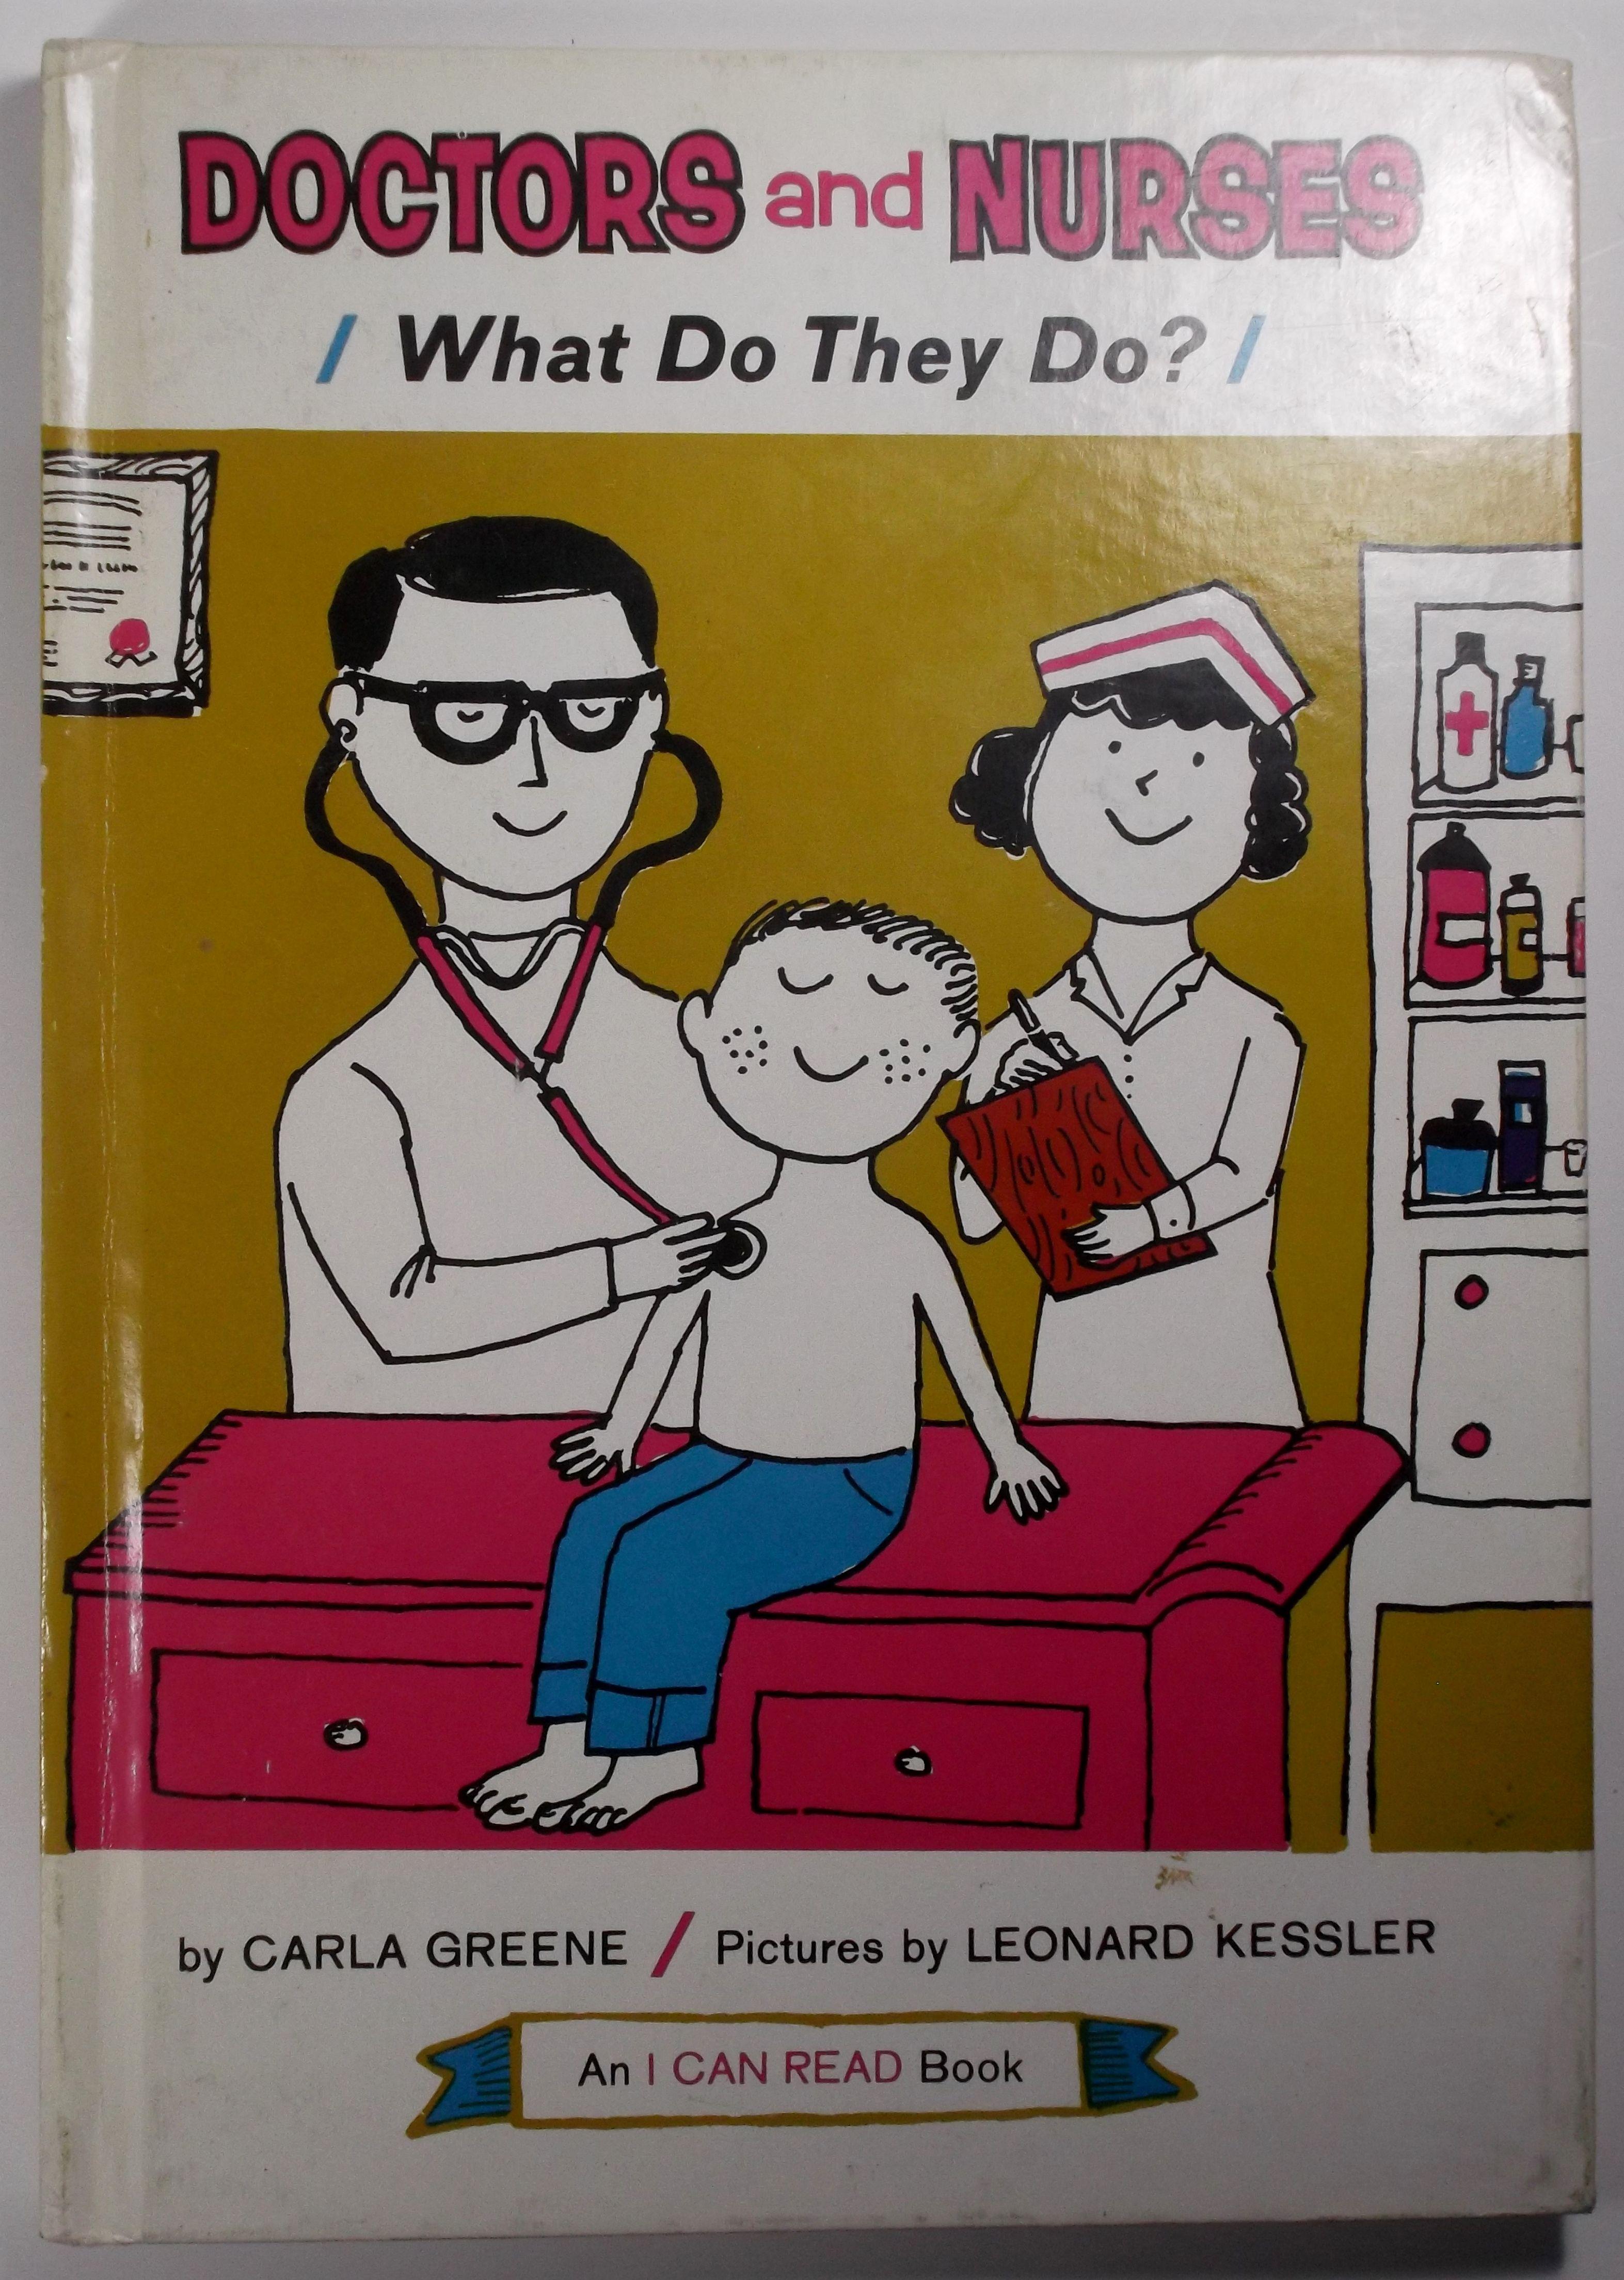 Books on physical therapy - Explore Children S Books Doctor And More Children S Booksdoctorphysical Therapychildren